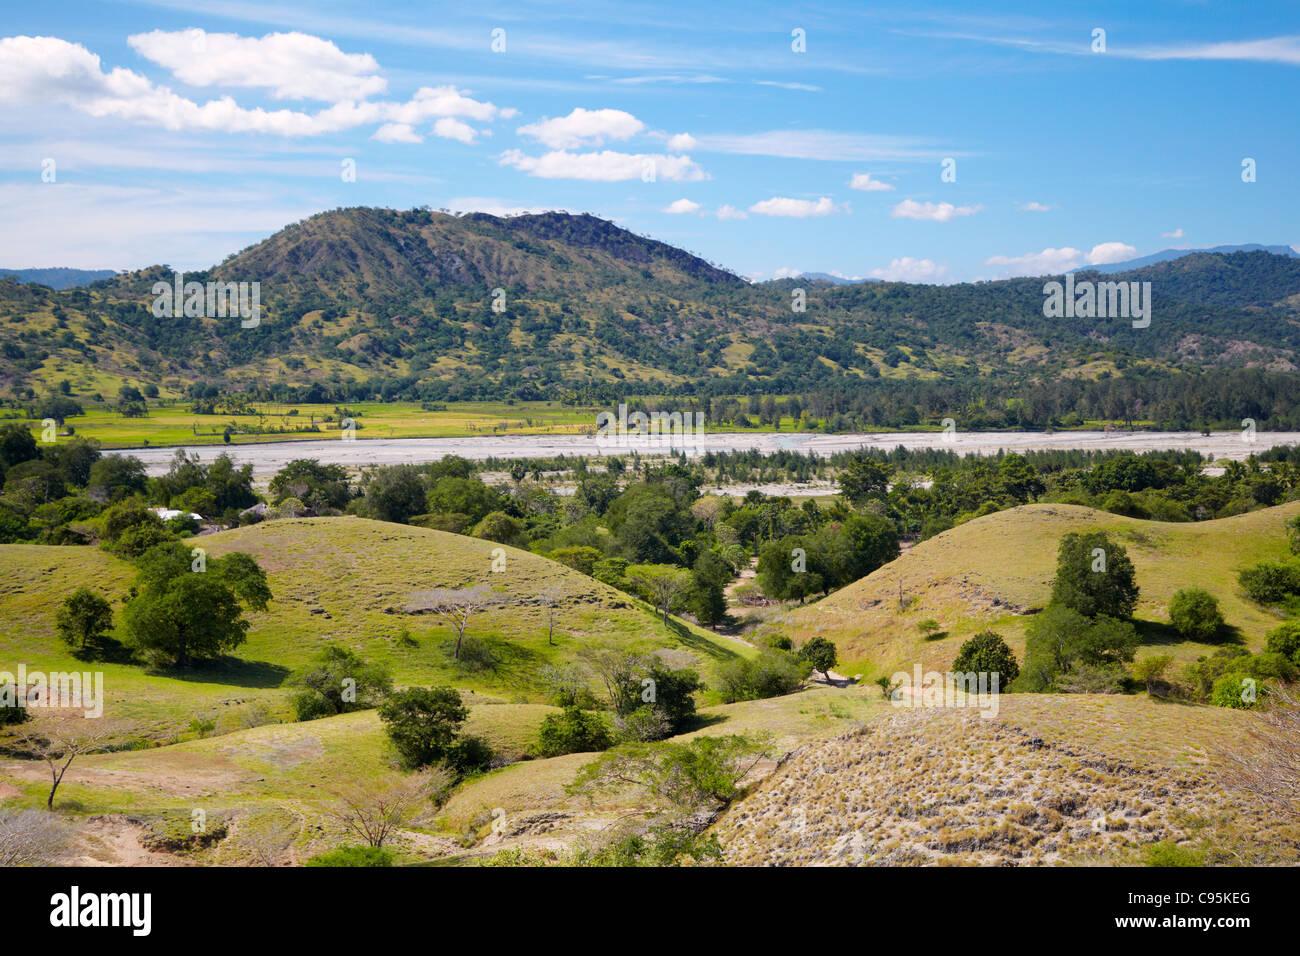 Laleia River, Timor-Leste (East Timor), Asia - Stock Image